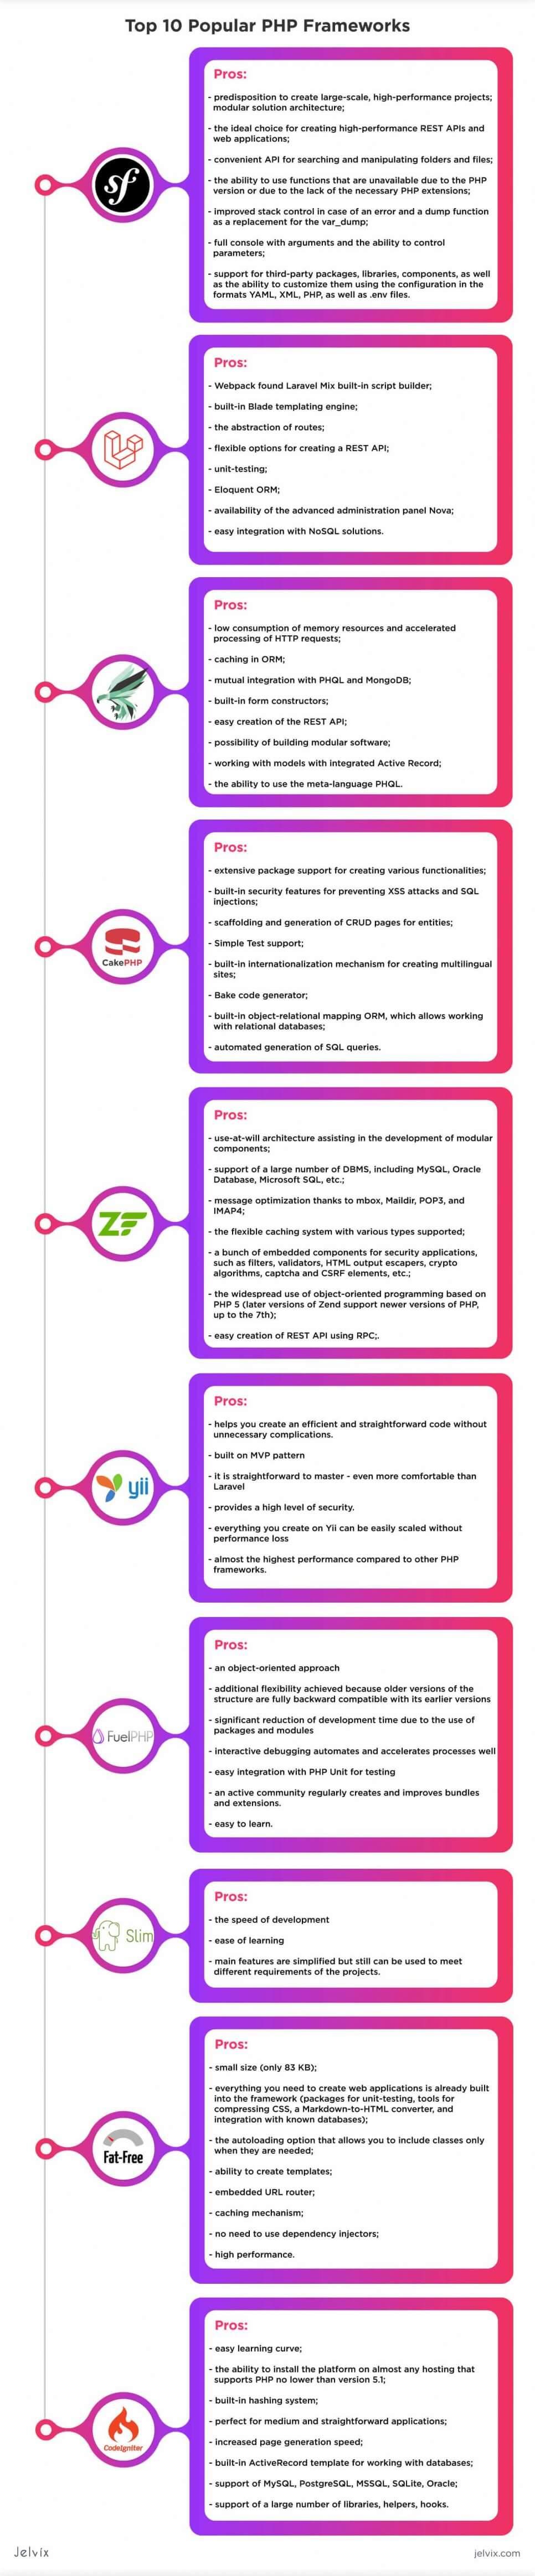 php framework infographic